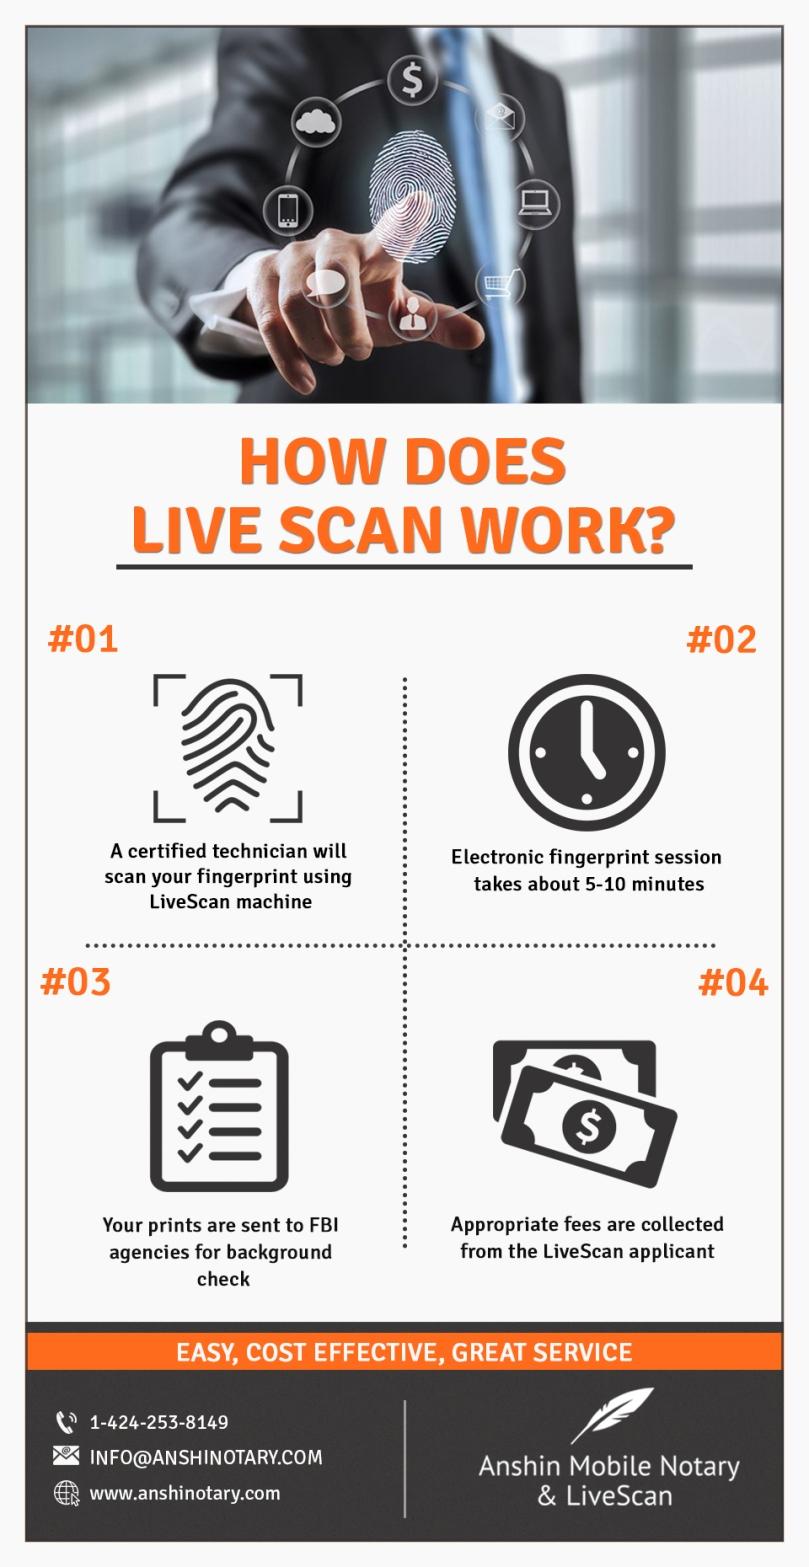 livescan – Anshin Mobile Notary & LiveScan